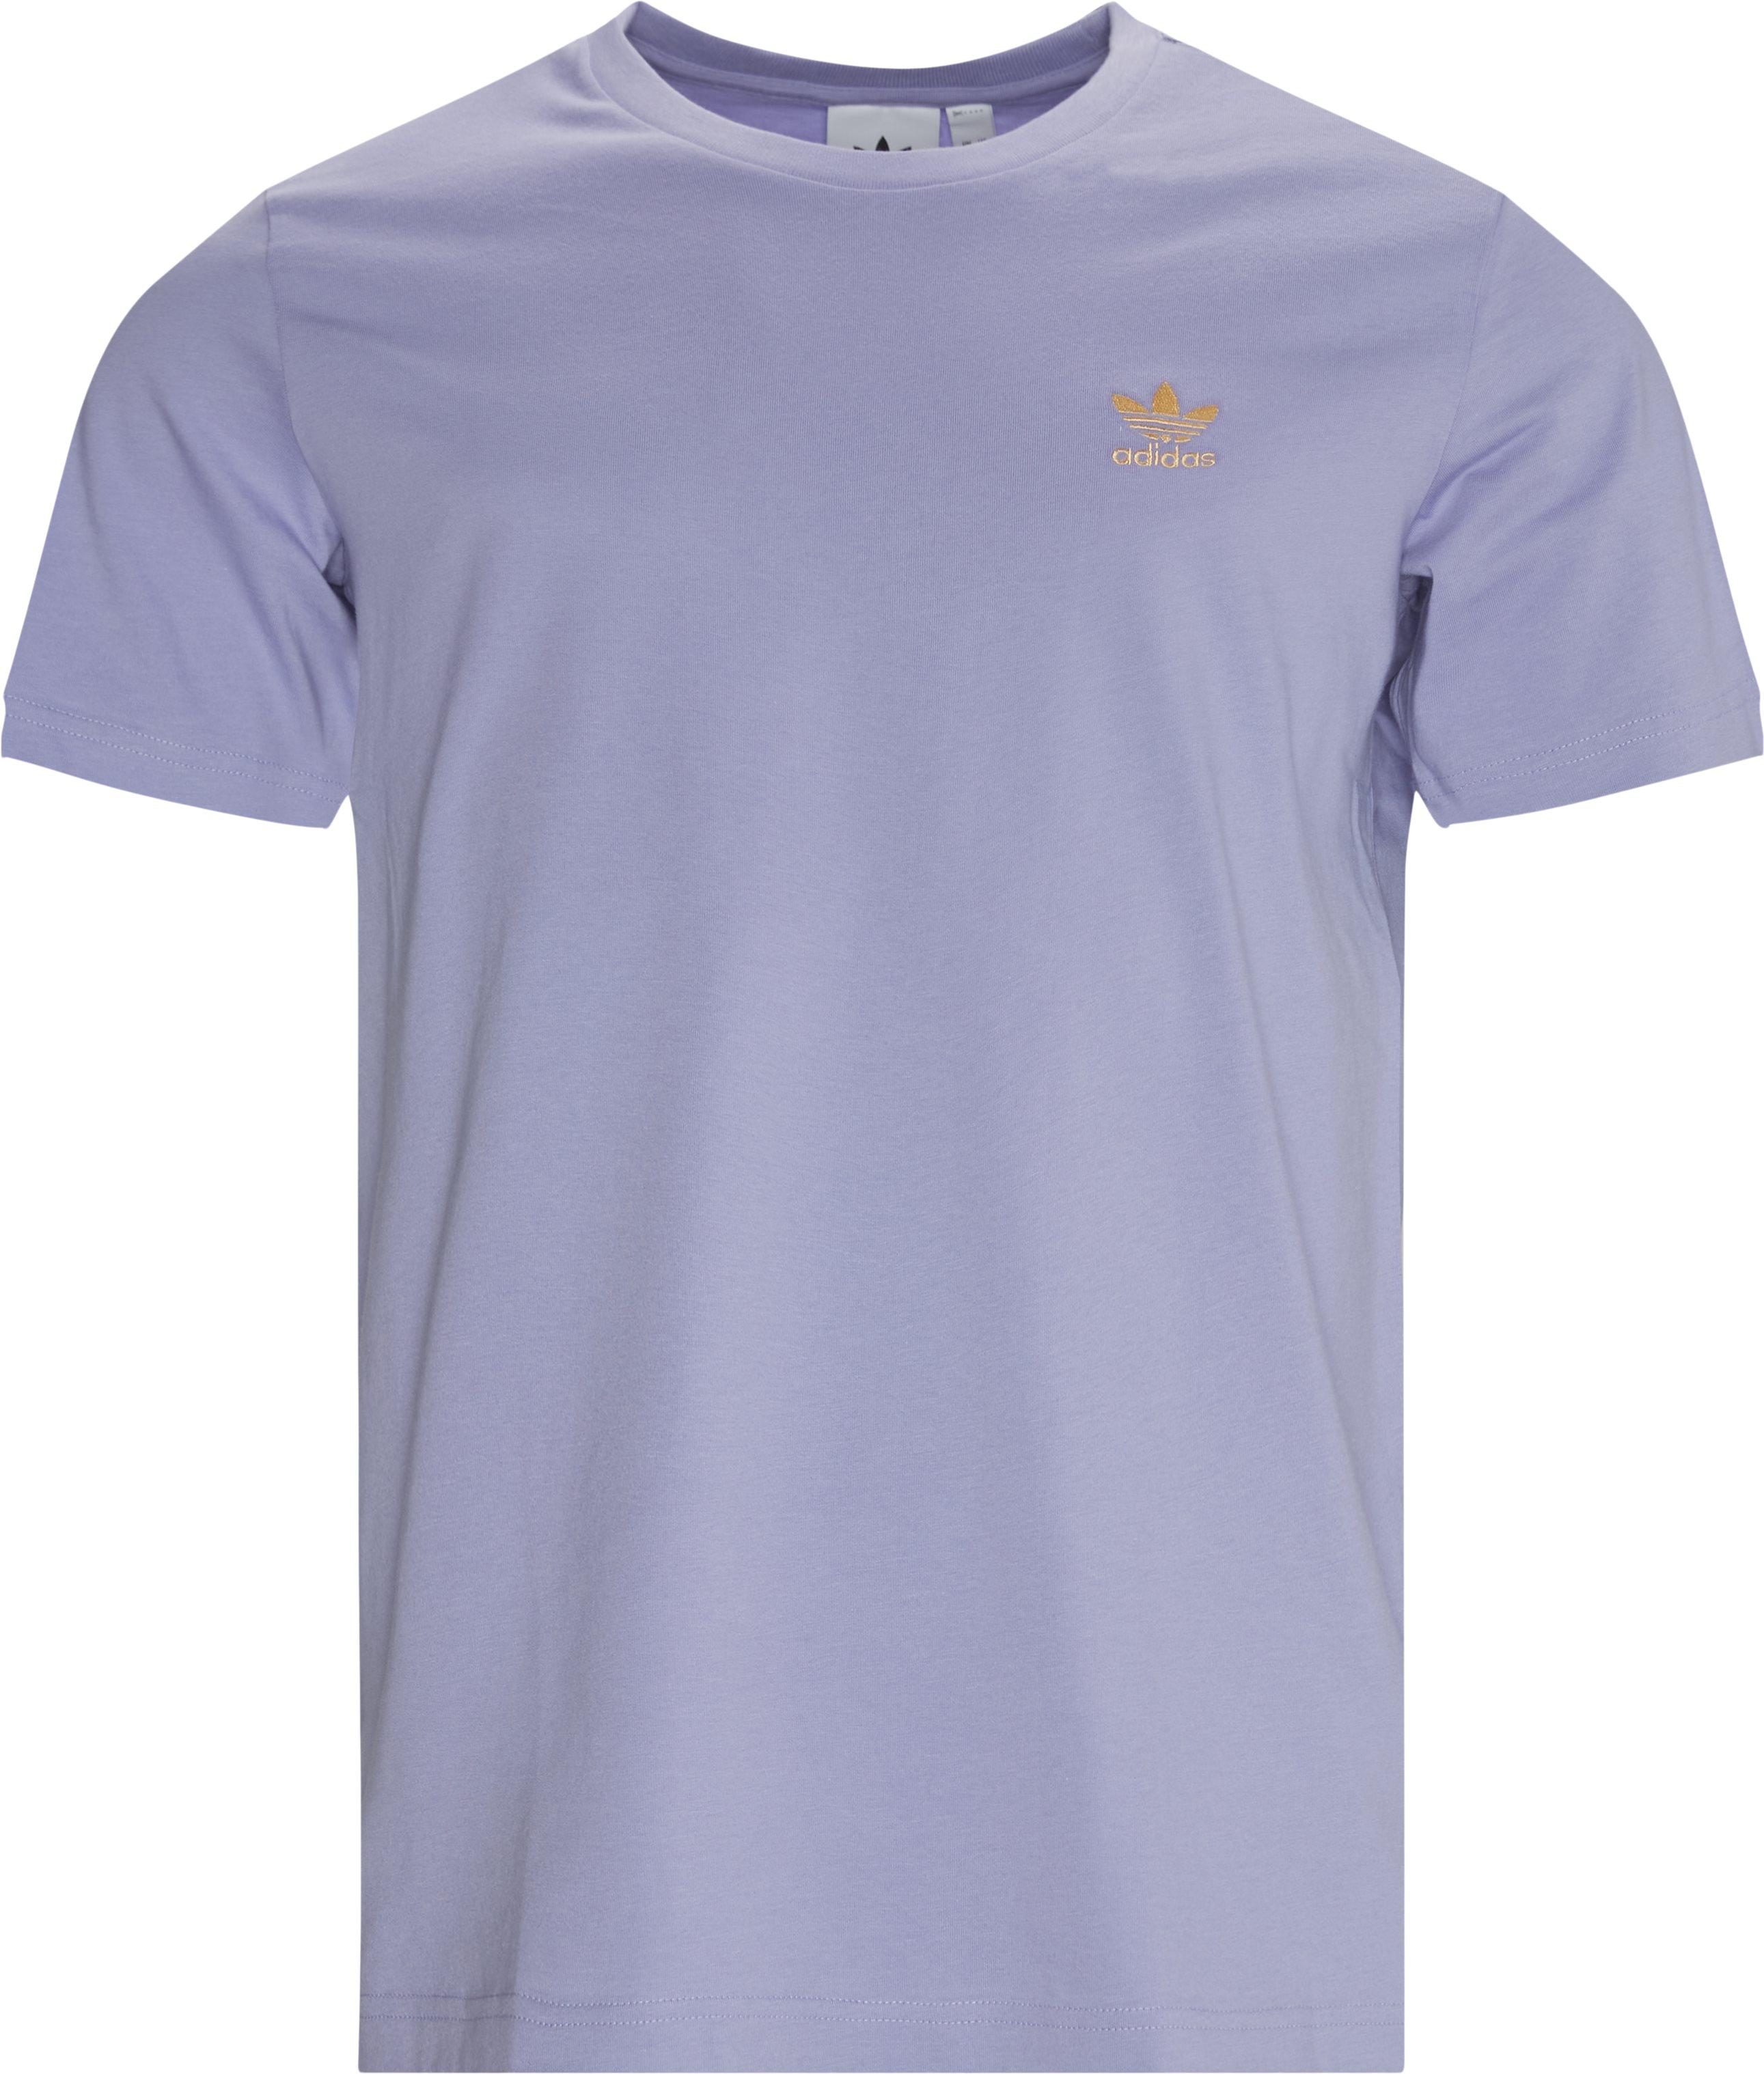 Essential Tee - T-shirts - Regular - Lila